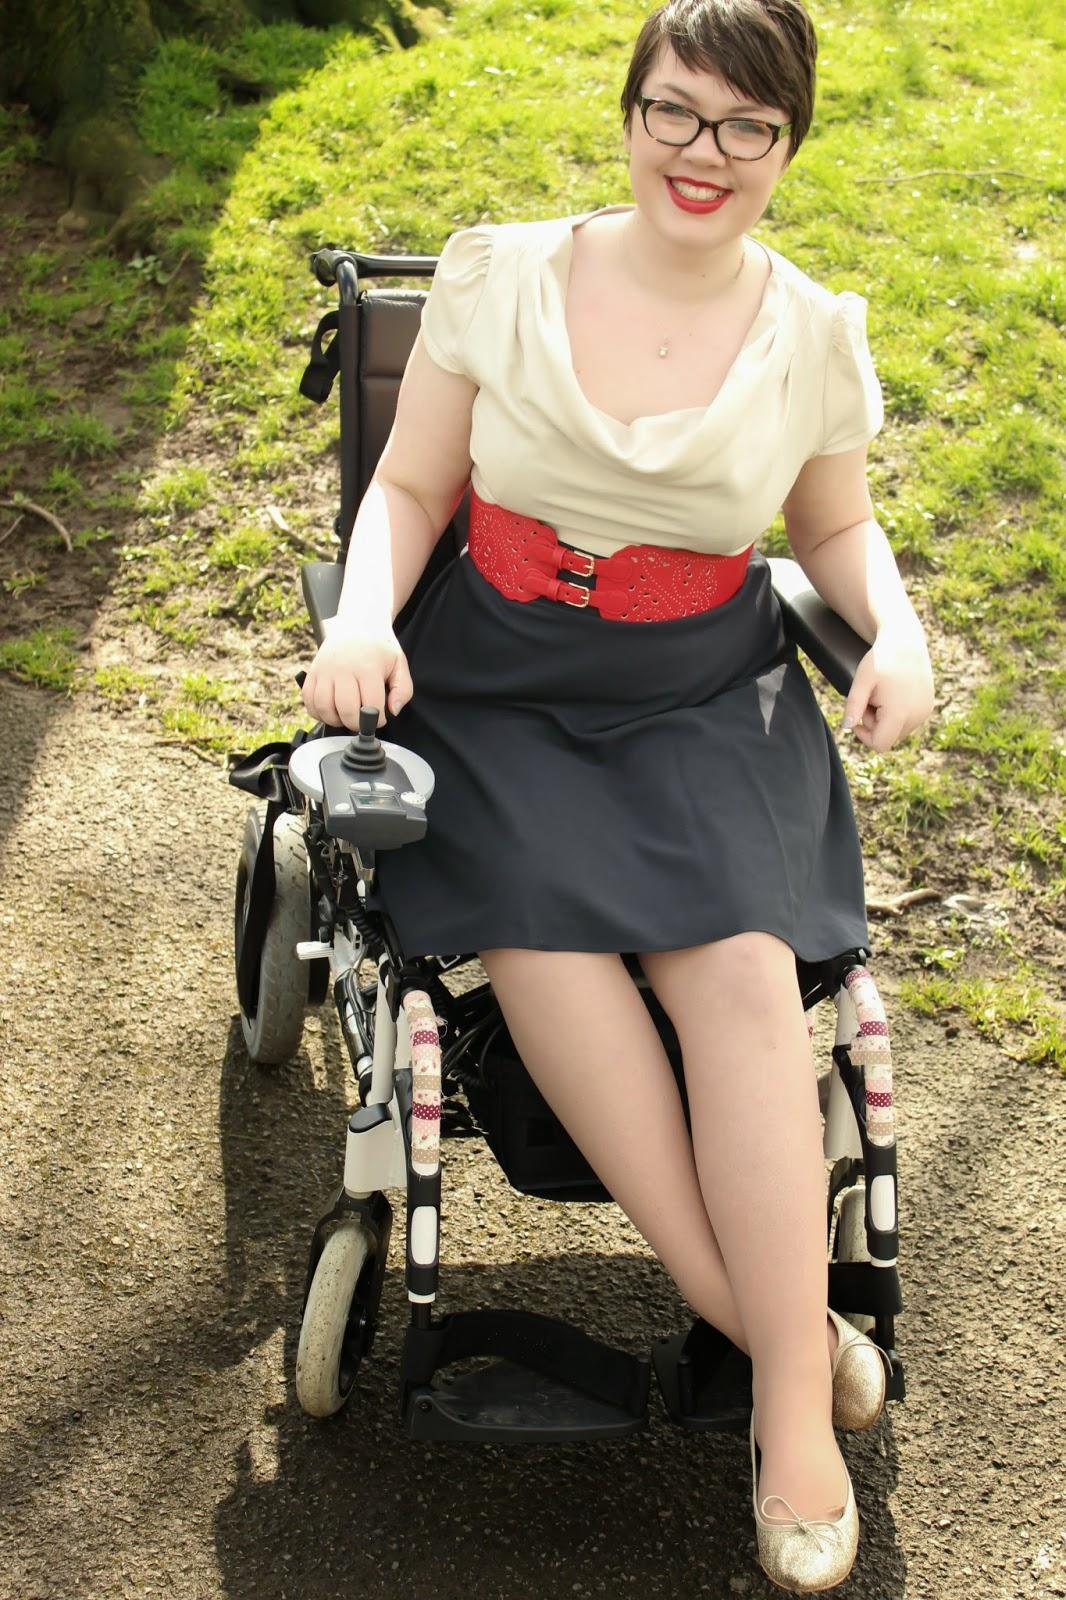 Wheelchair Hot Wheels Rubber Chair Casters Fashion 39hot 39 Wheelingalong24